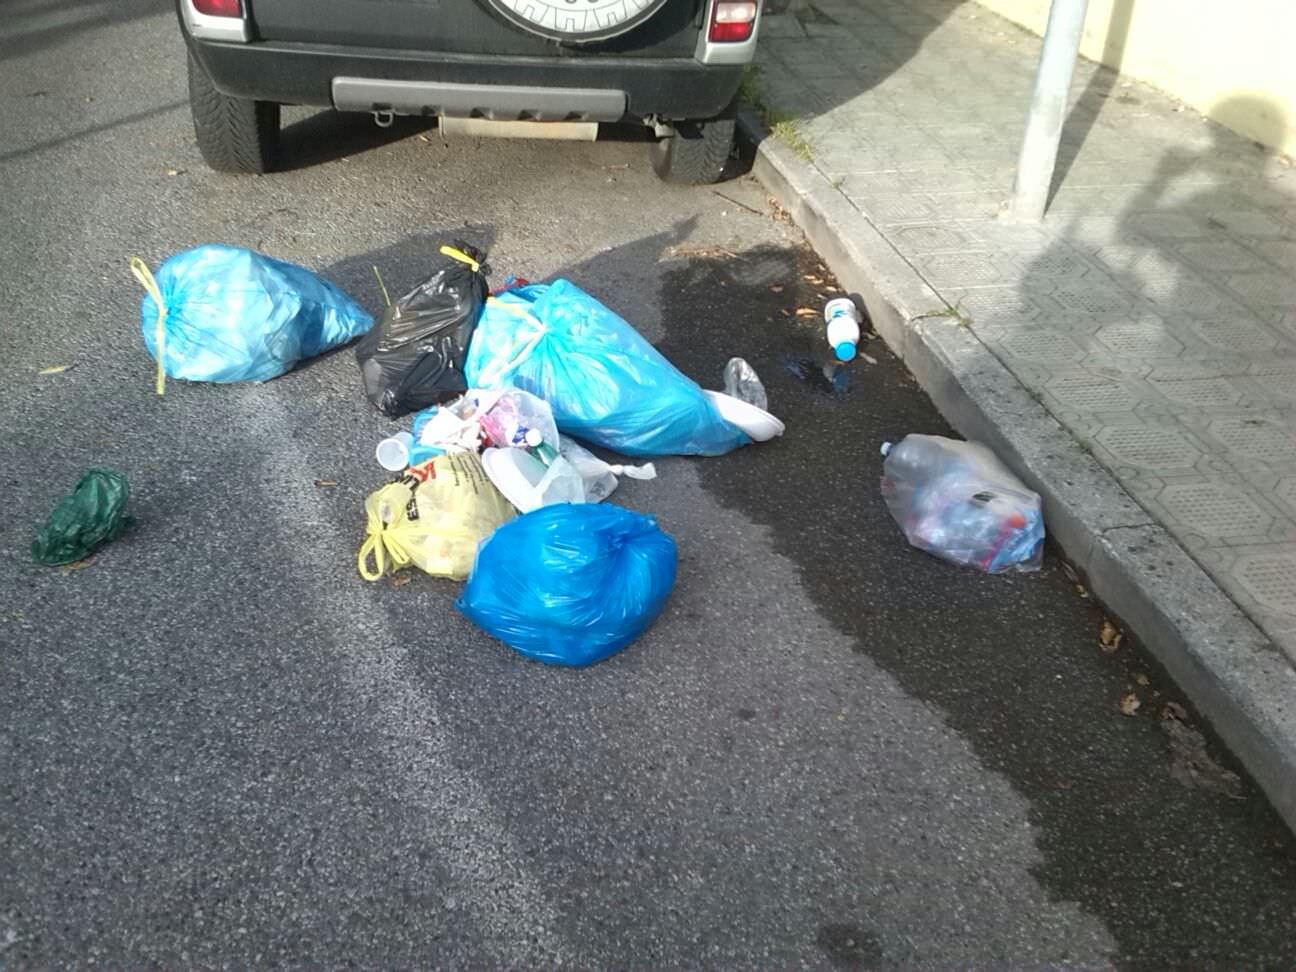 Rifiuti in terra e degrado, ancora proteste a Lido di Camaiore